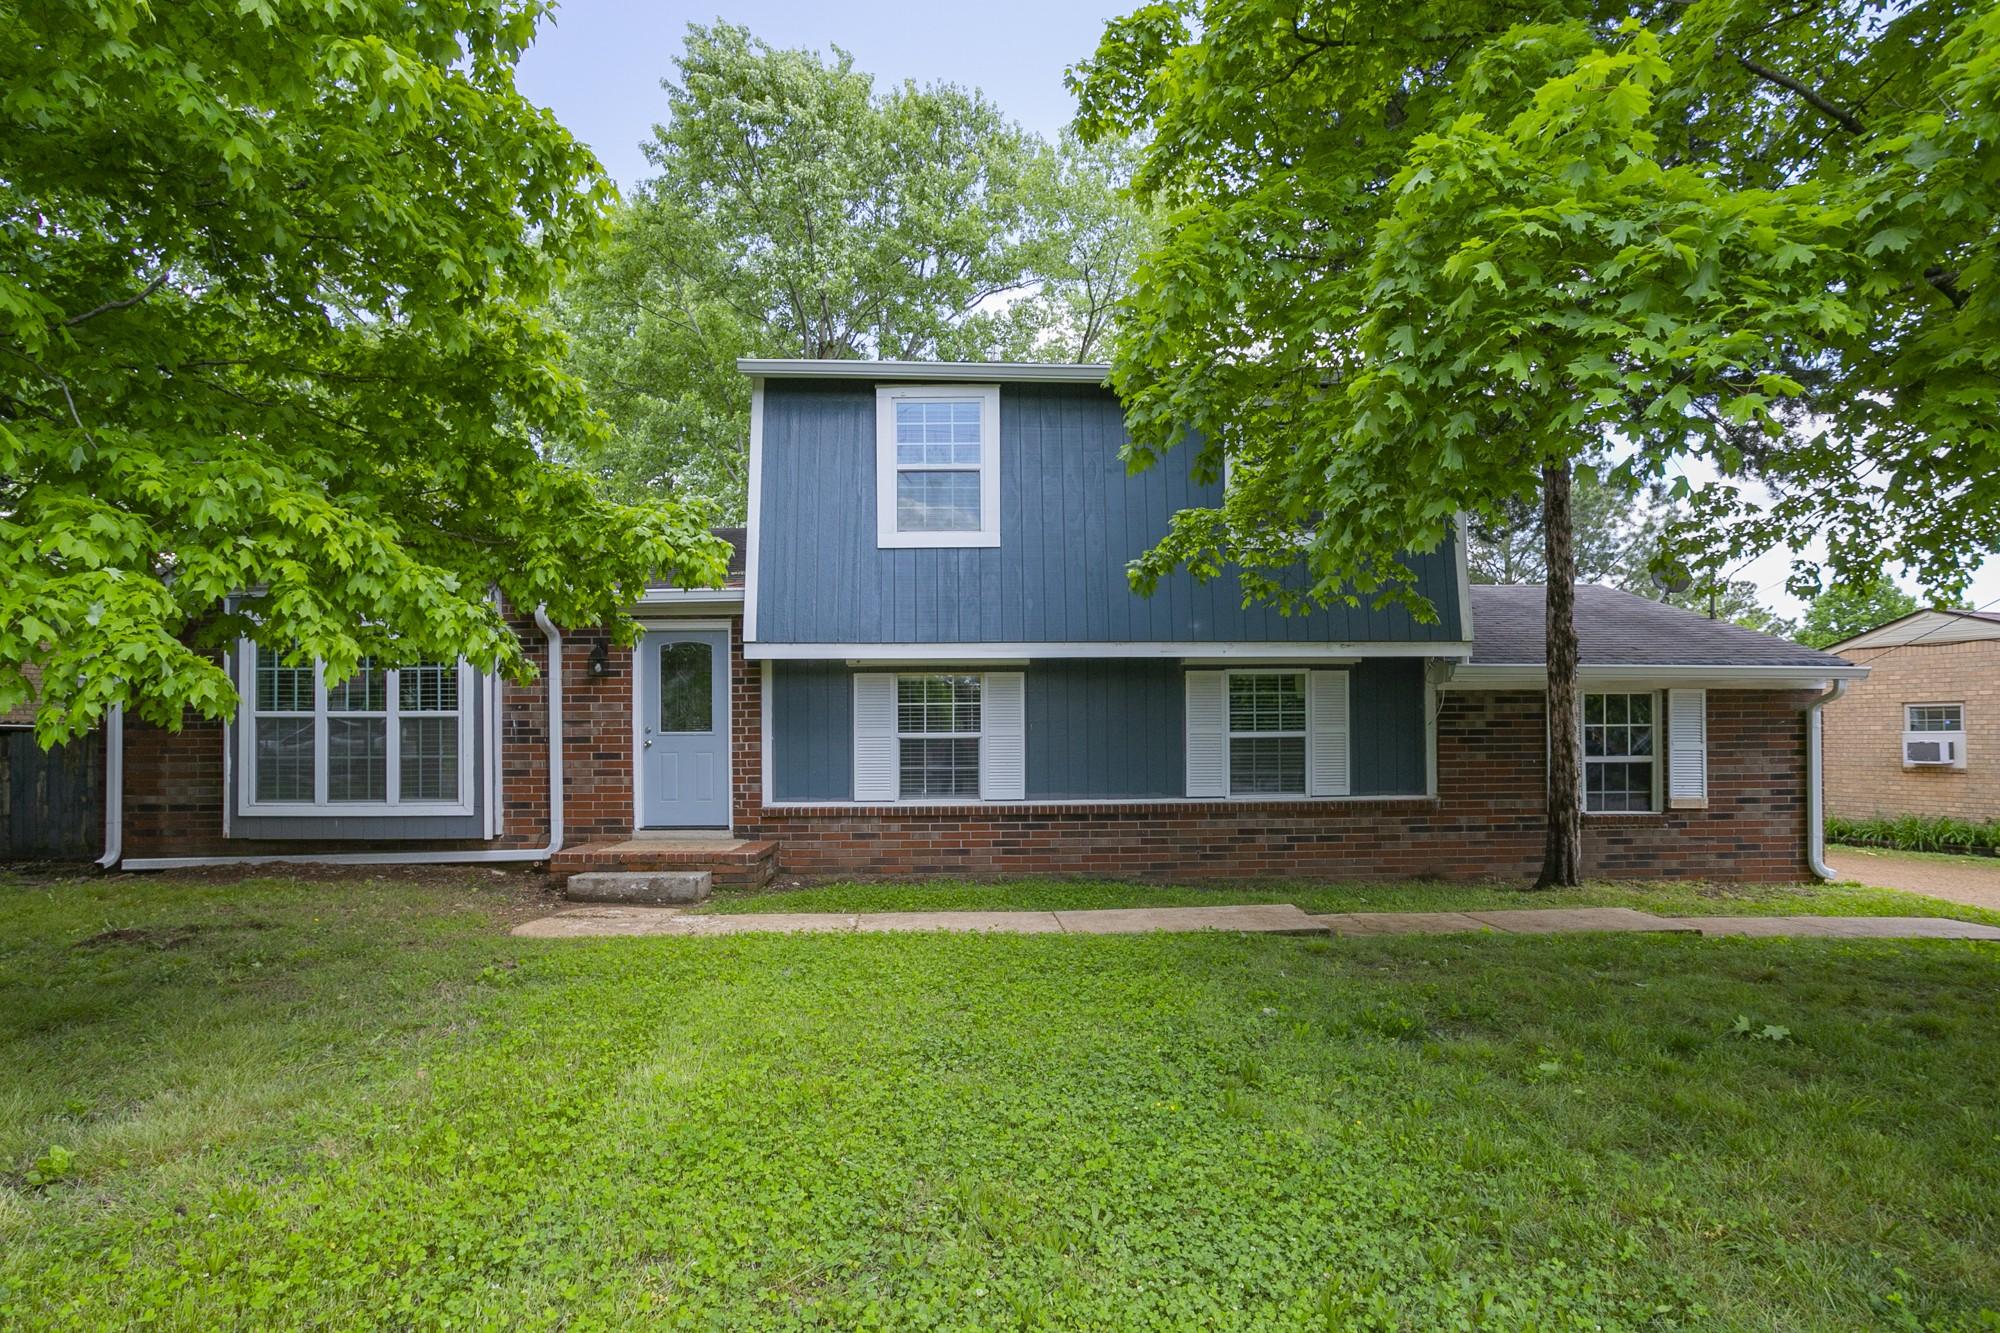 309 Eulala Cir Property Photo - Nashville, TN real estate listing